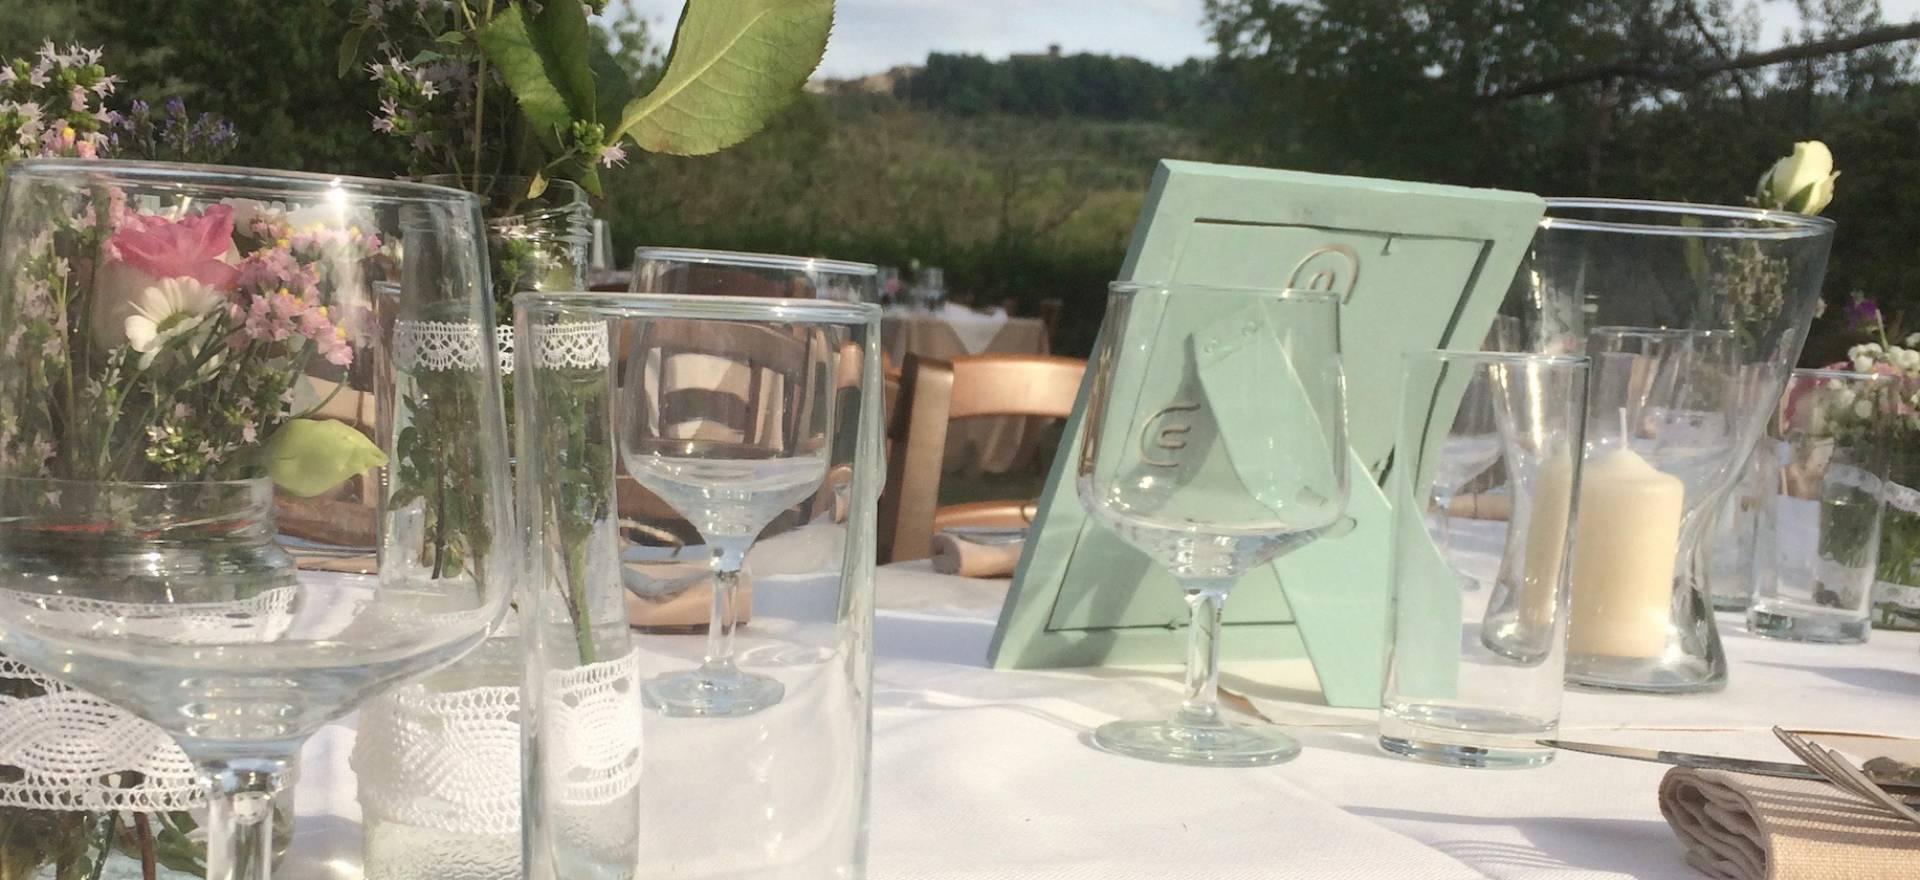 Agriturismo Toscana Agriturismo per famiglie in Toscana con ristorante